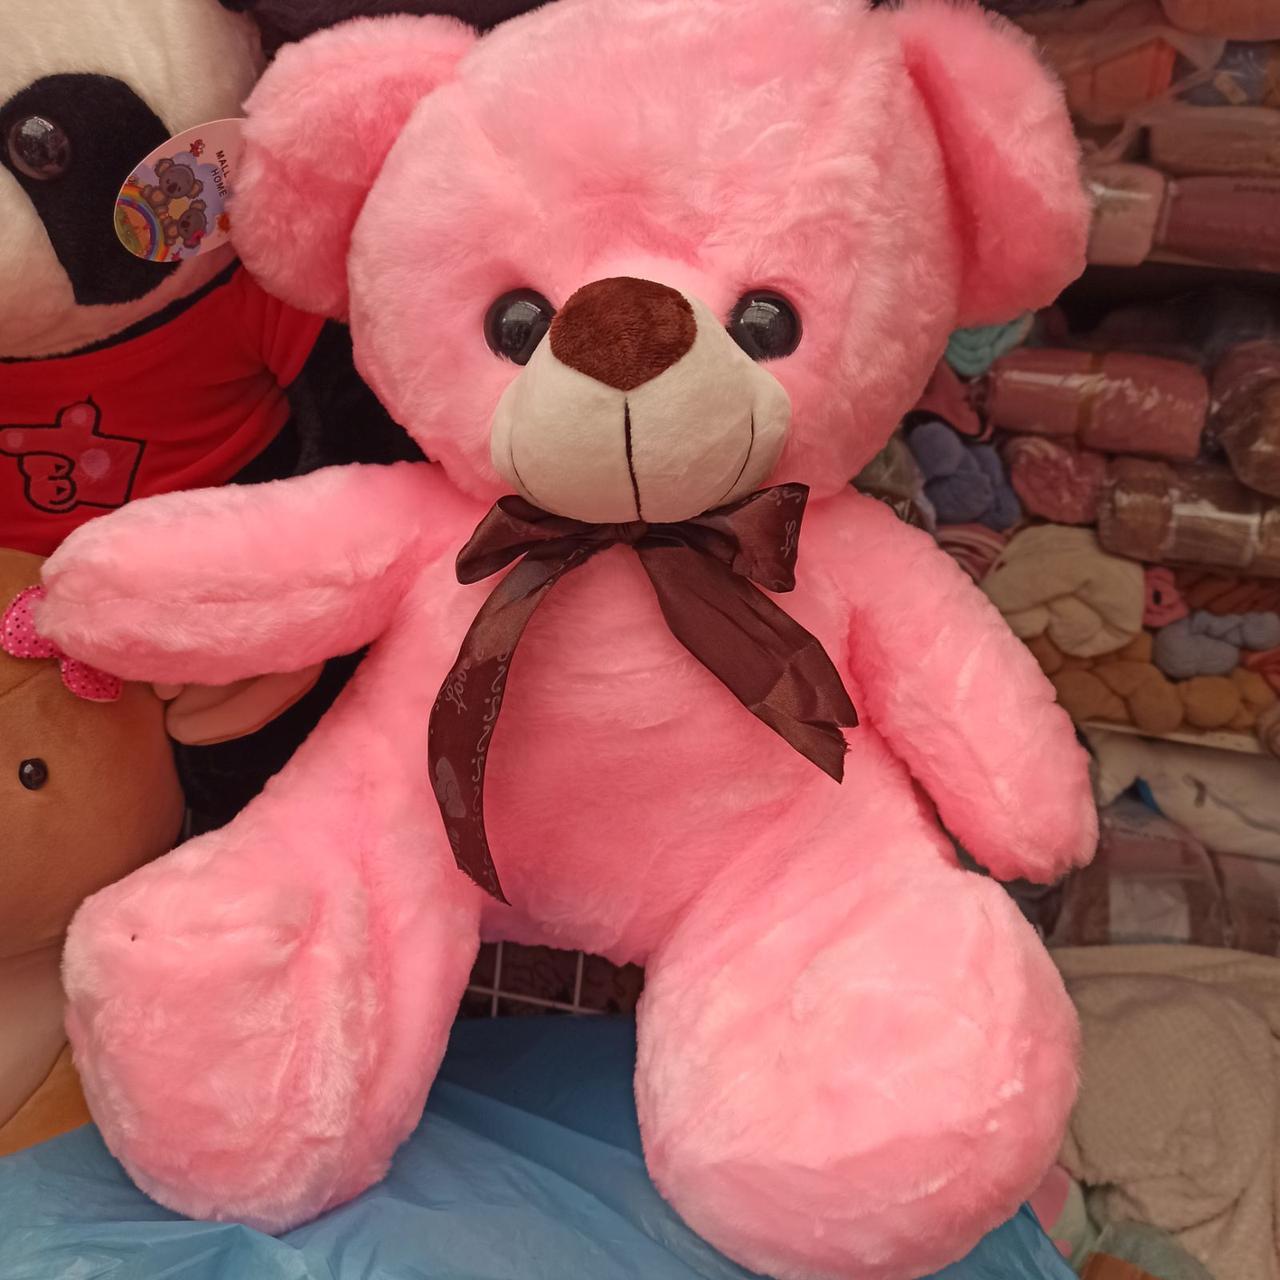 Плед іграшка подушка 3в1 Мишко | Іграшка дитячий плед | Іграшки-Подушки | М'яка іграшка Ведмедик Рожевого кольору